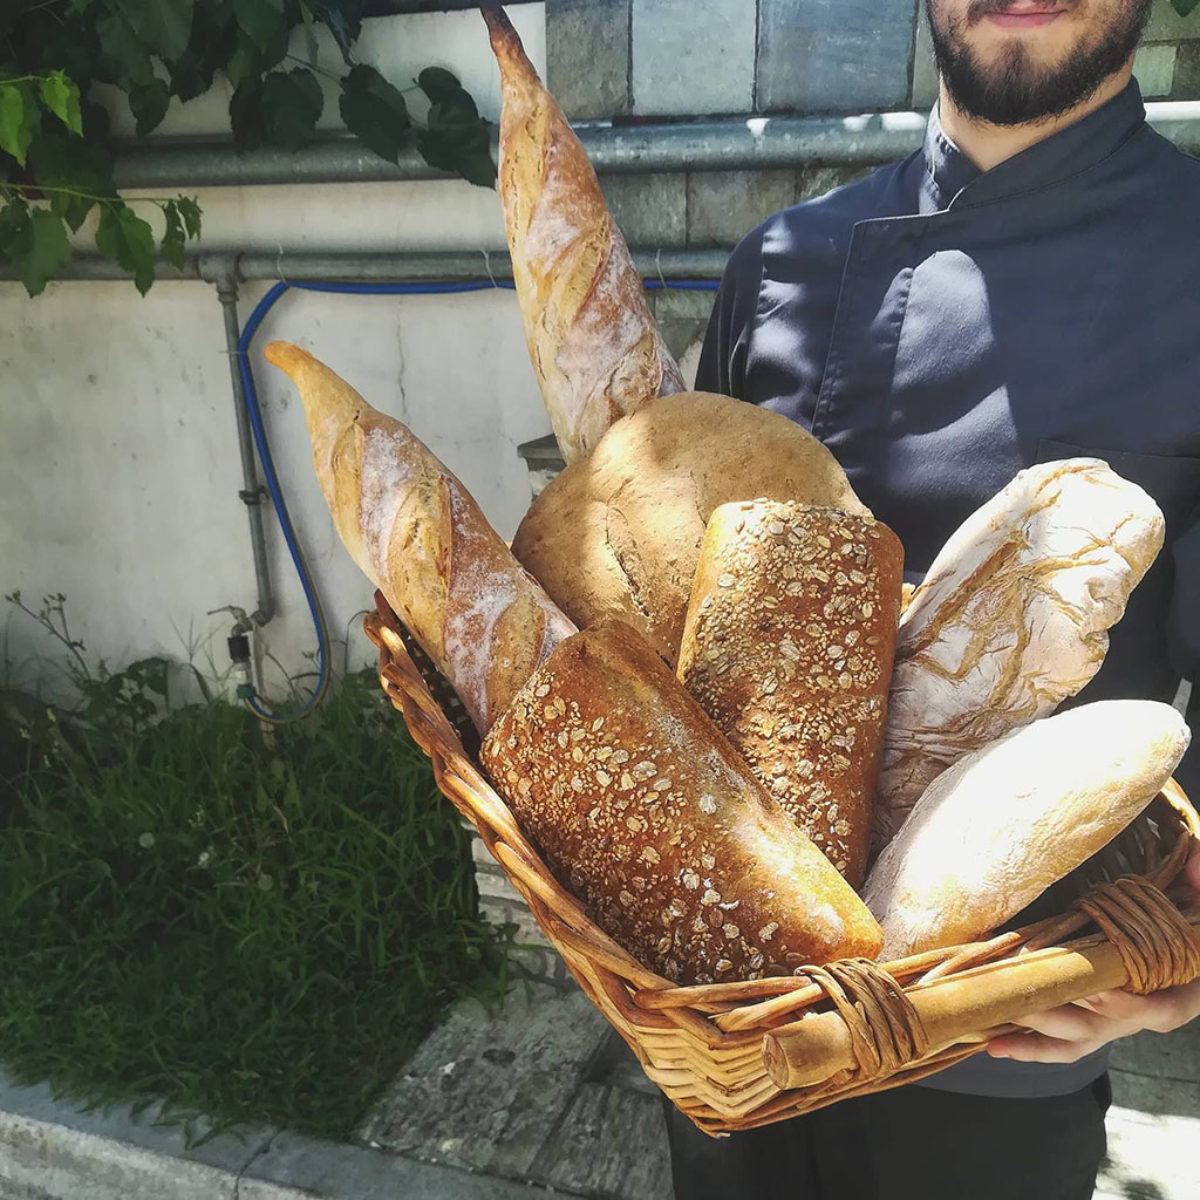 Yiamas Gastro Bar - Καλαμάτα - Μοντέρνα Ευρωπαϊκή Κουζίνα - Μουσικές βραδιές - Gastronomy 2